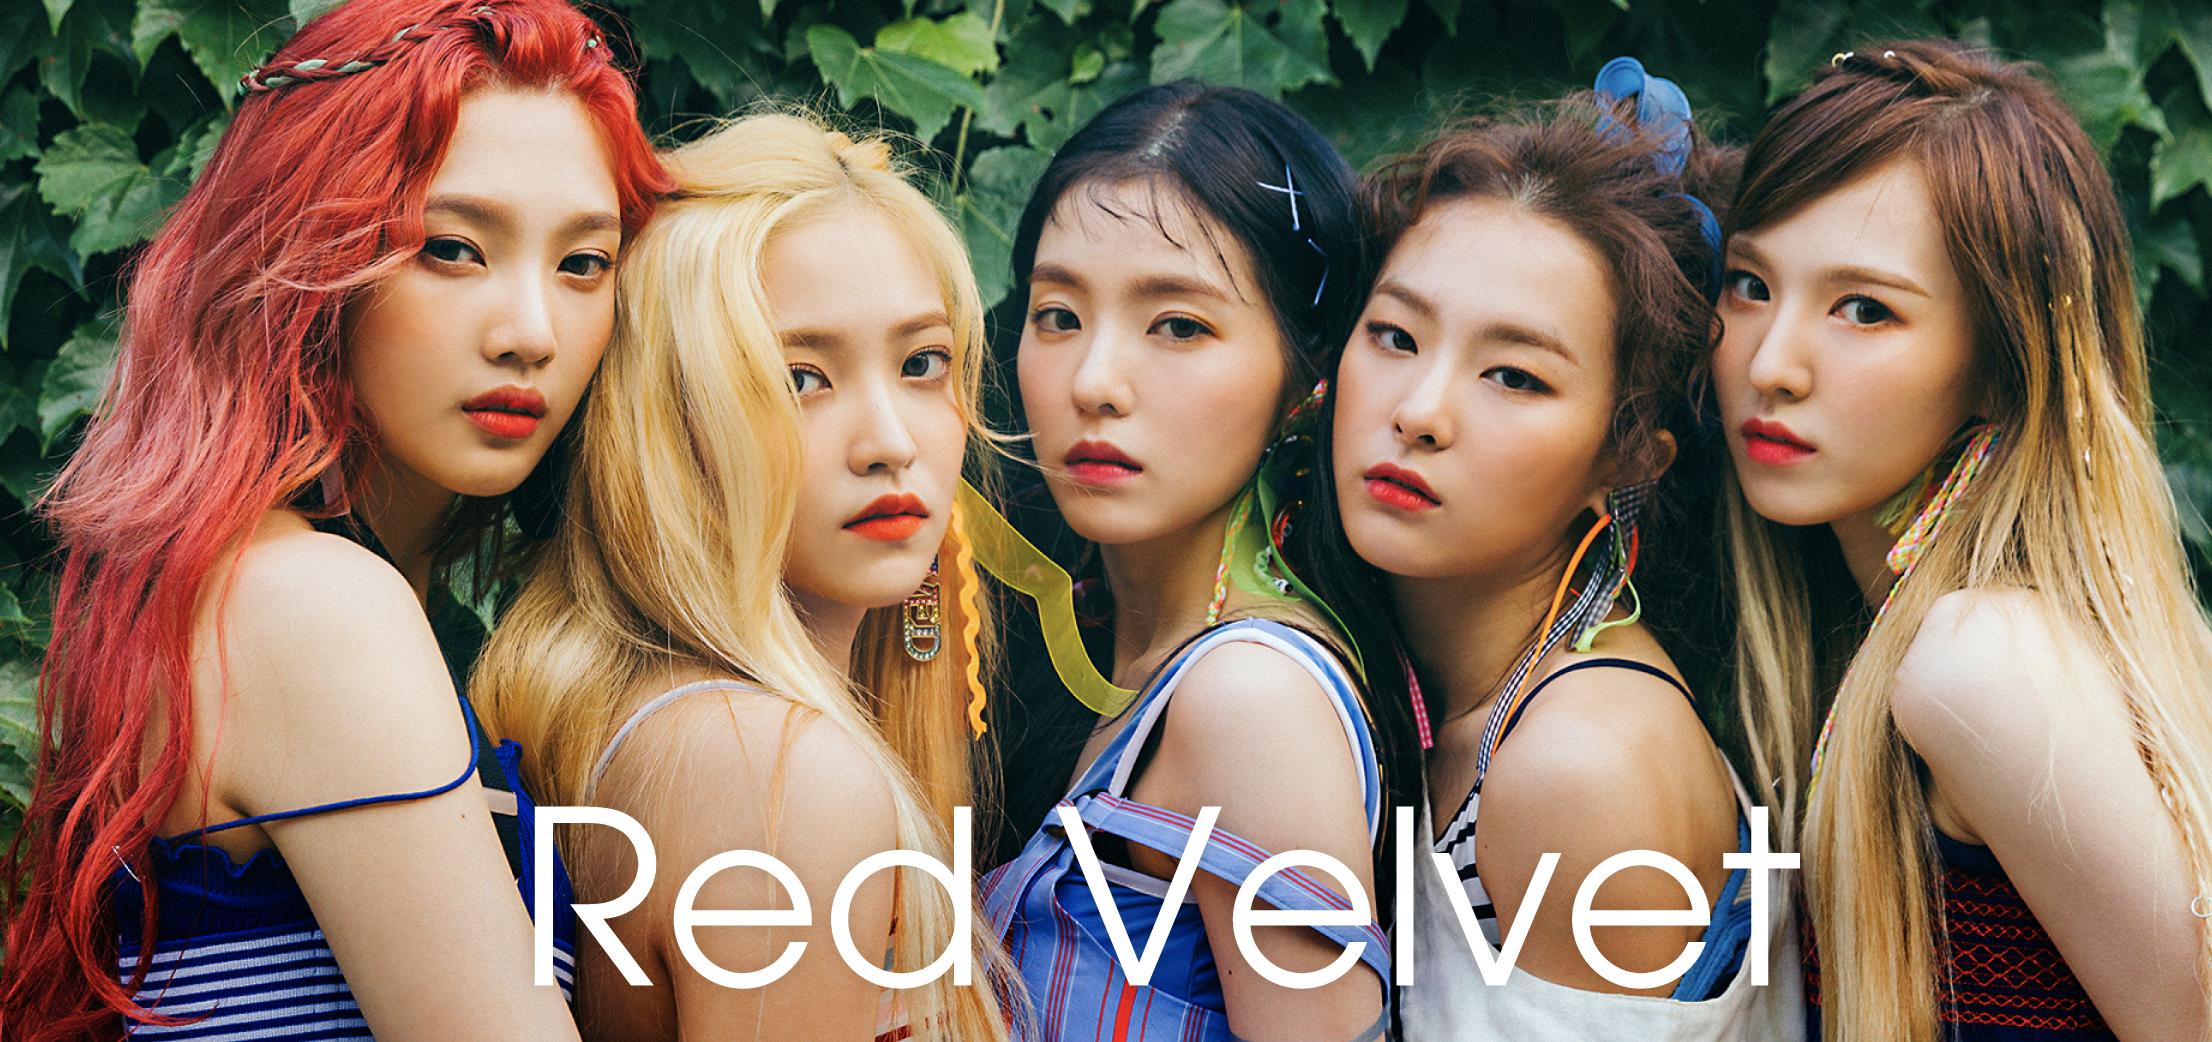 Sejeong Gugudan K Pop Girl Beautiful Wallpaper 38435: Red Velvetの顔は整形?昔と現在の画像を比較【アイリン・スルギ・ウェンディ・ジョイ・イェリ】